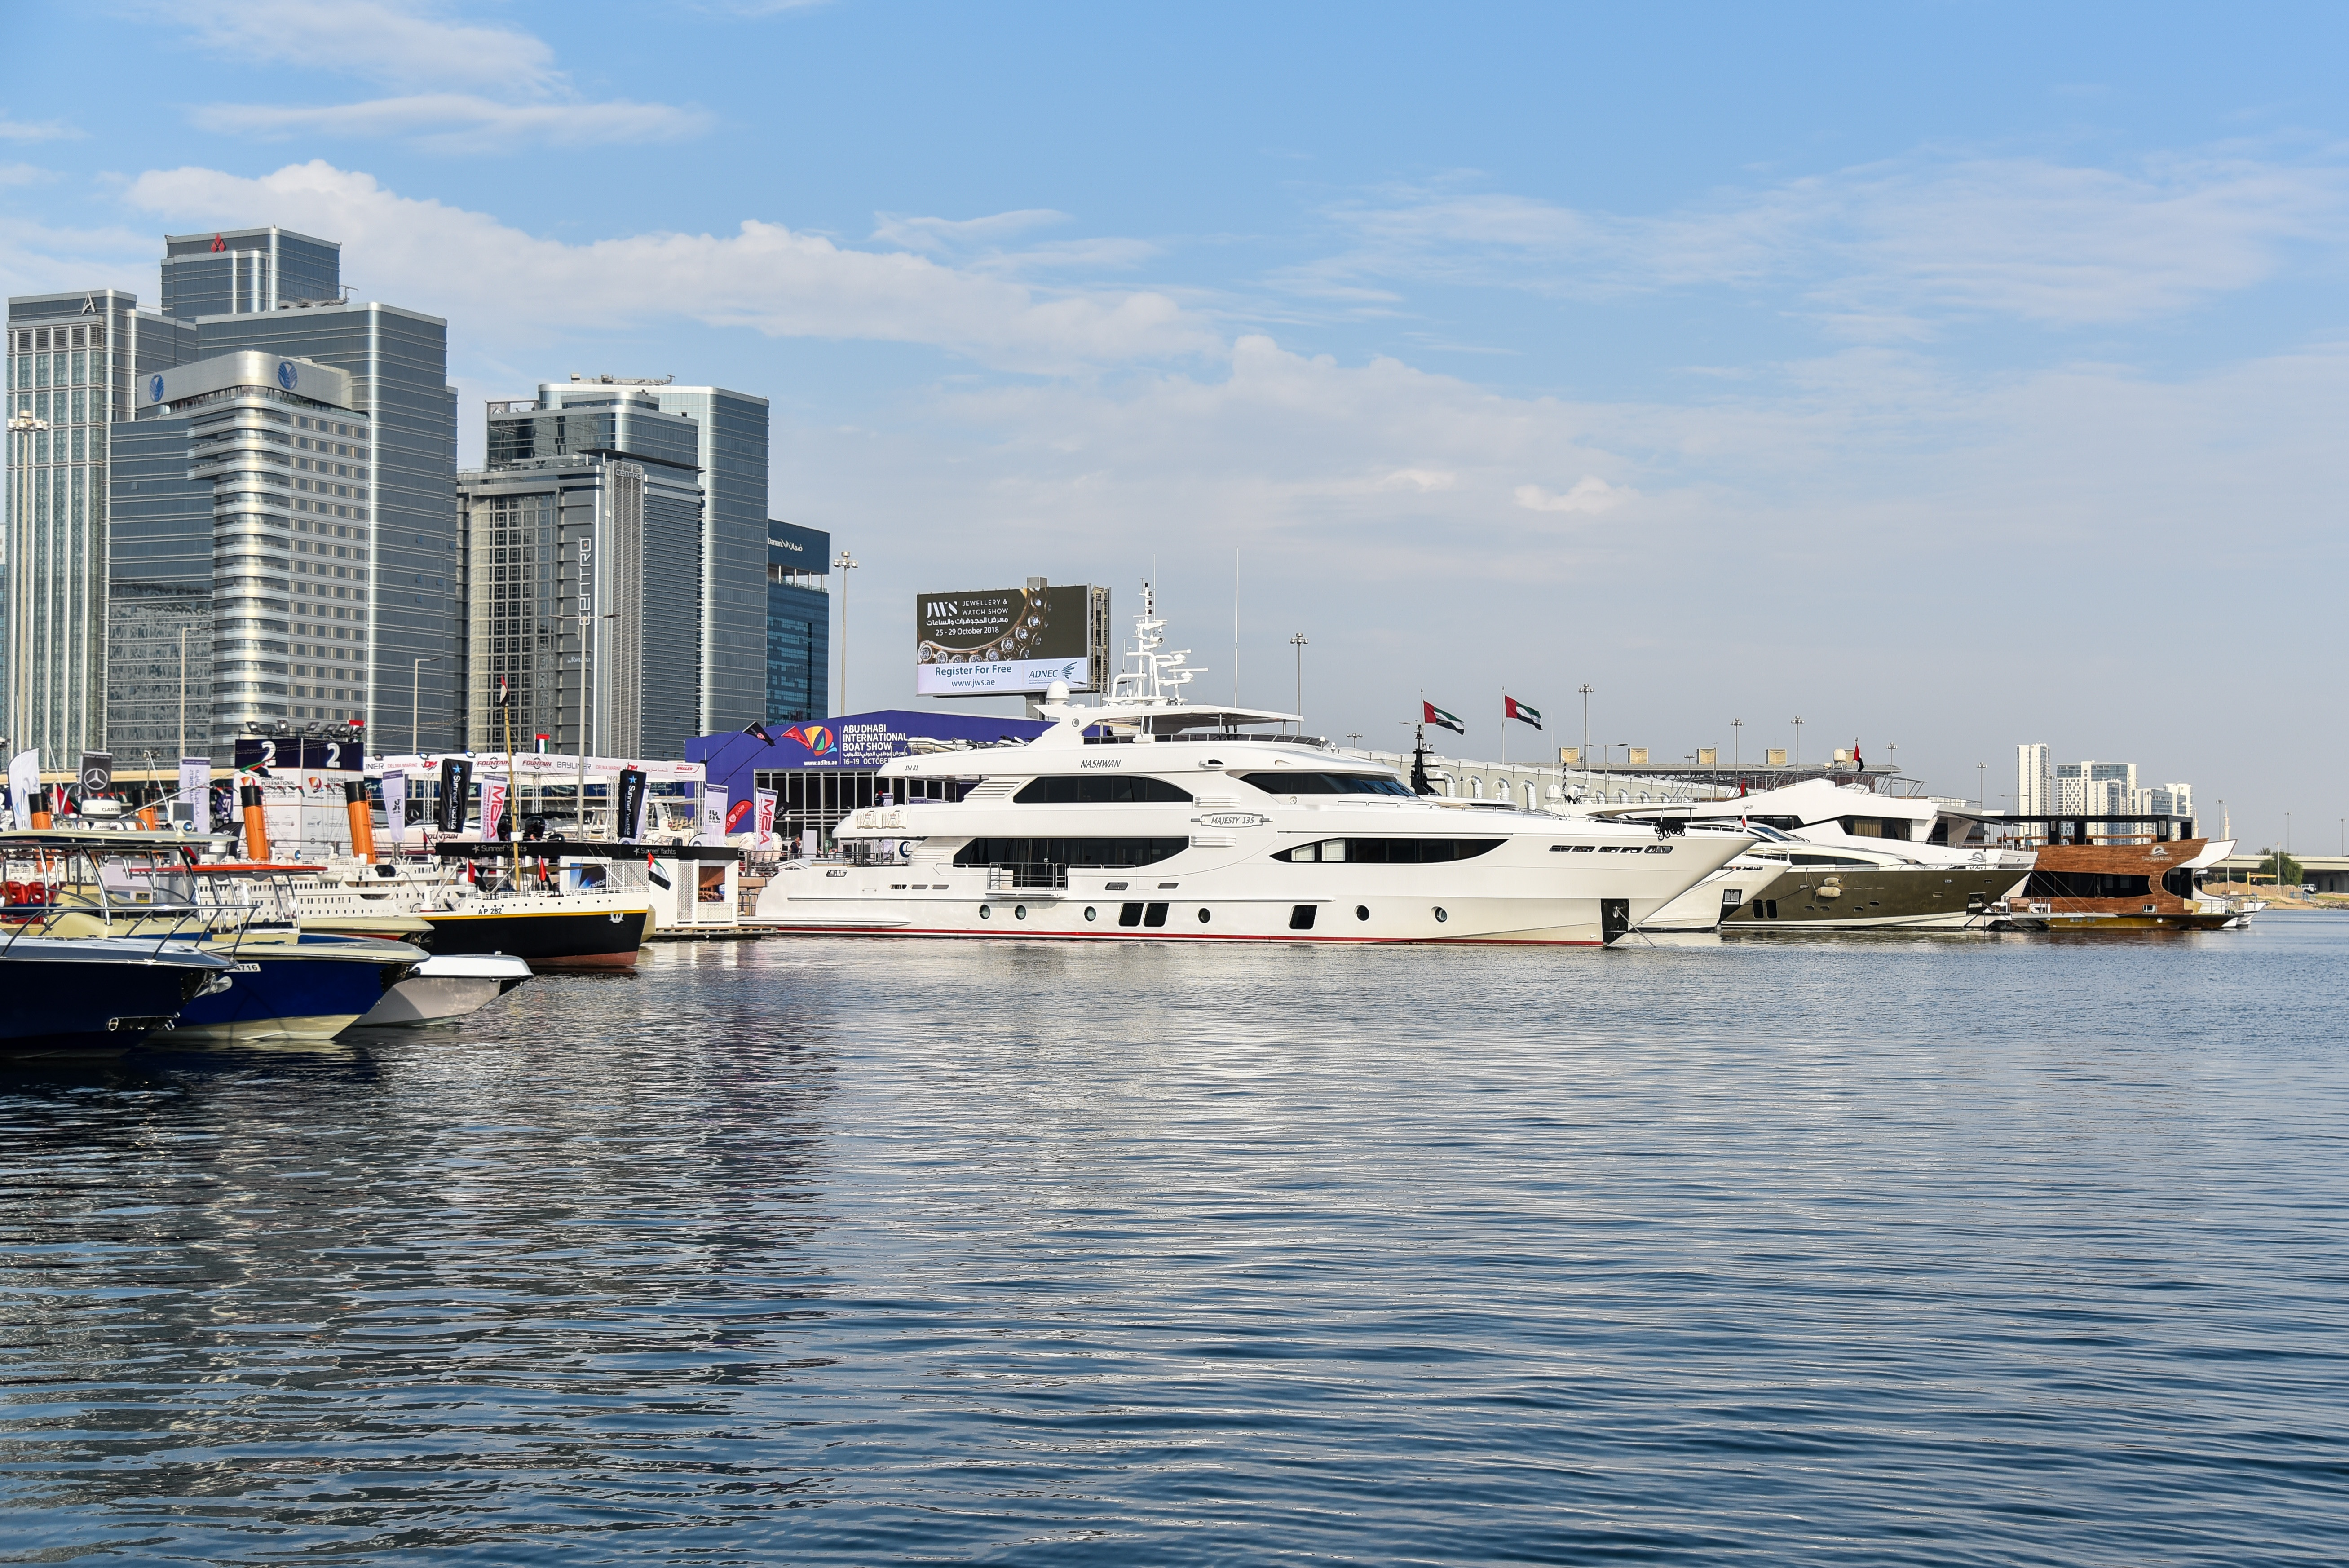 Gulf Craft at Abu Dhabi Boat Show 2018 Day 3 (3).jpg